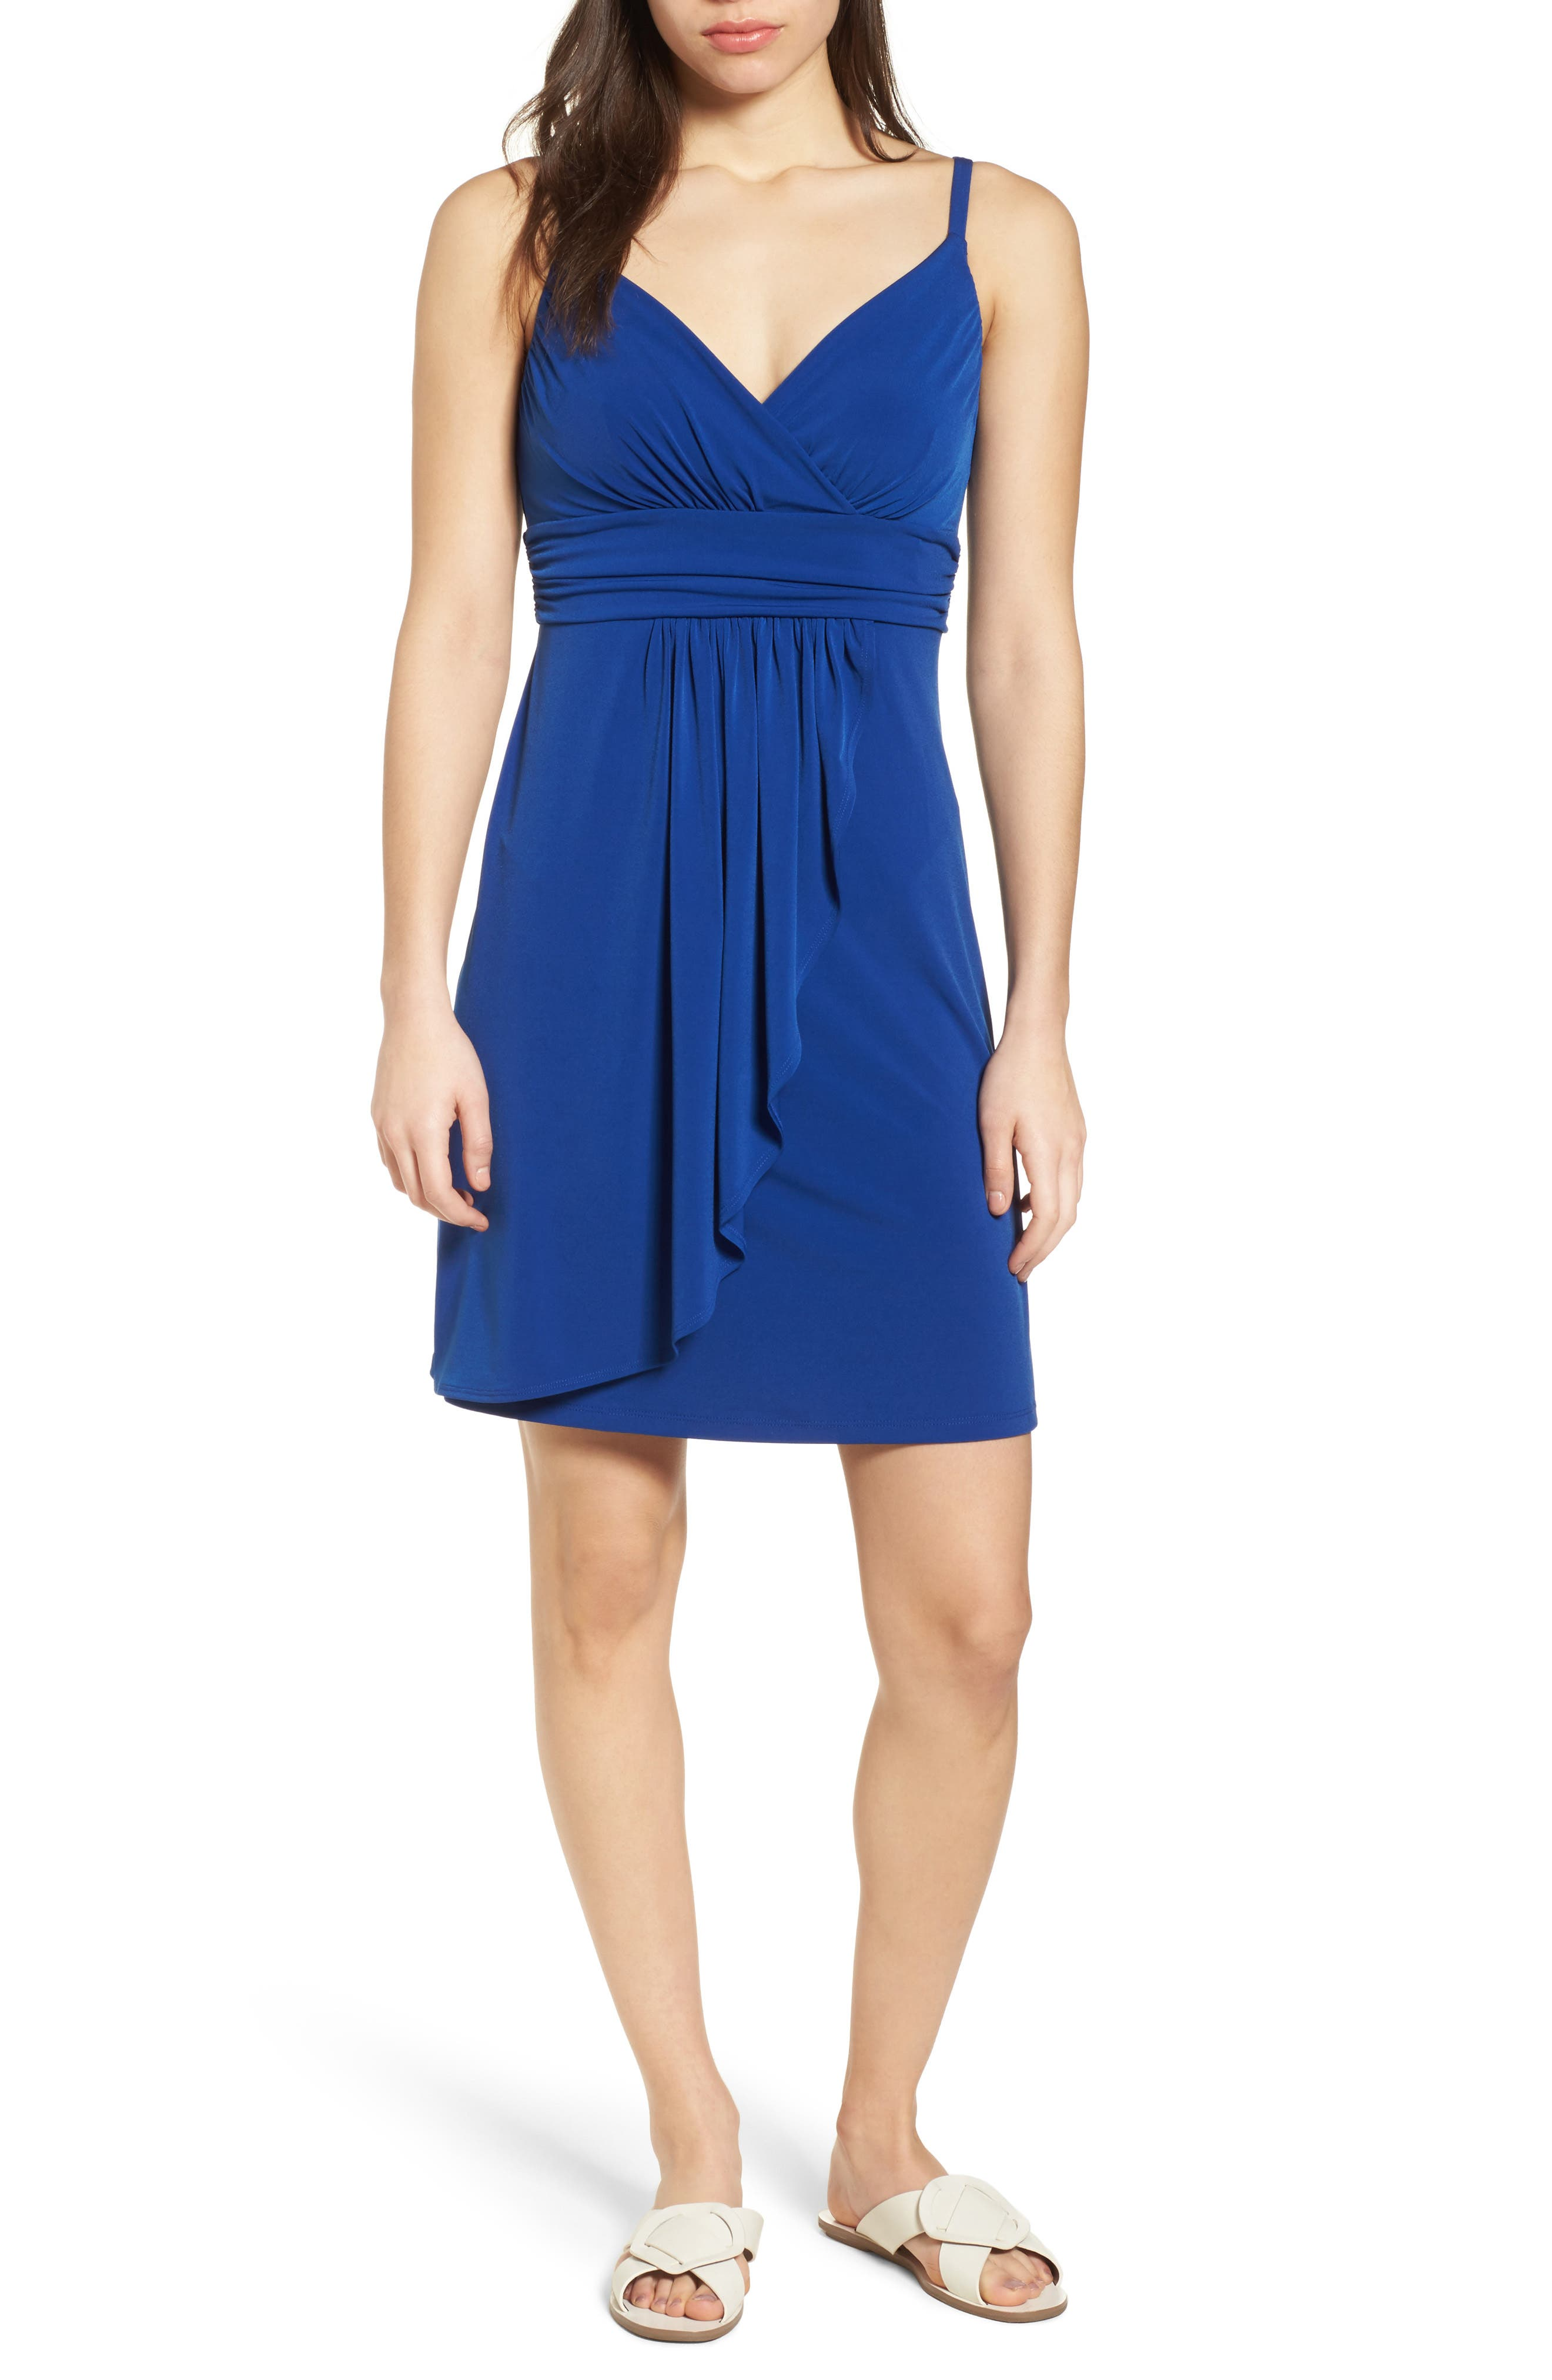 Elenna Stretch Jersey Sundress,                             Main thumbnail 1, color,                             DARK BLUE